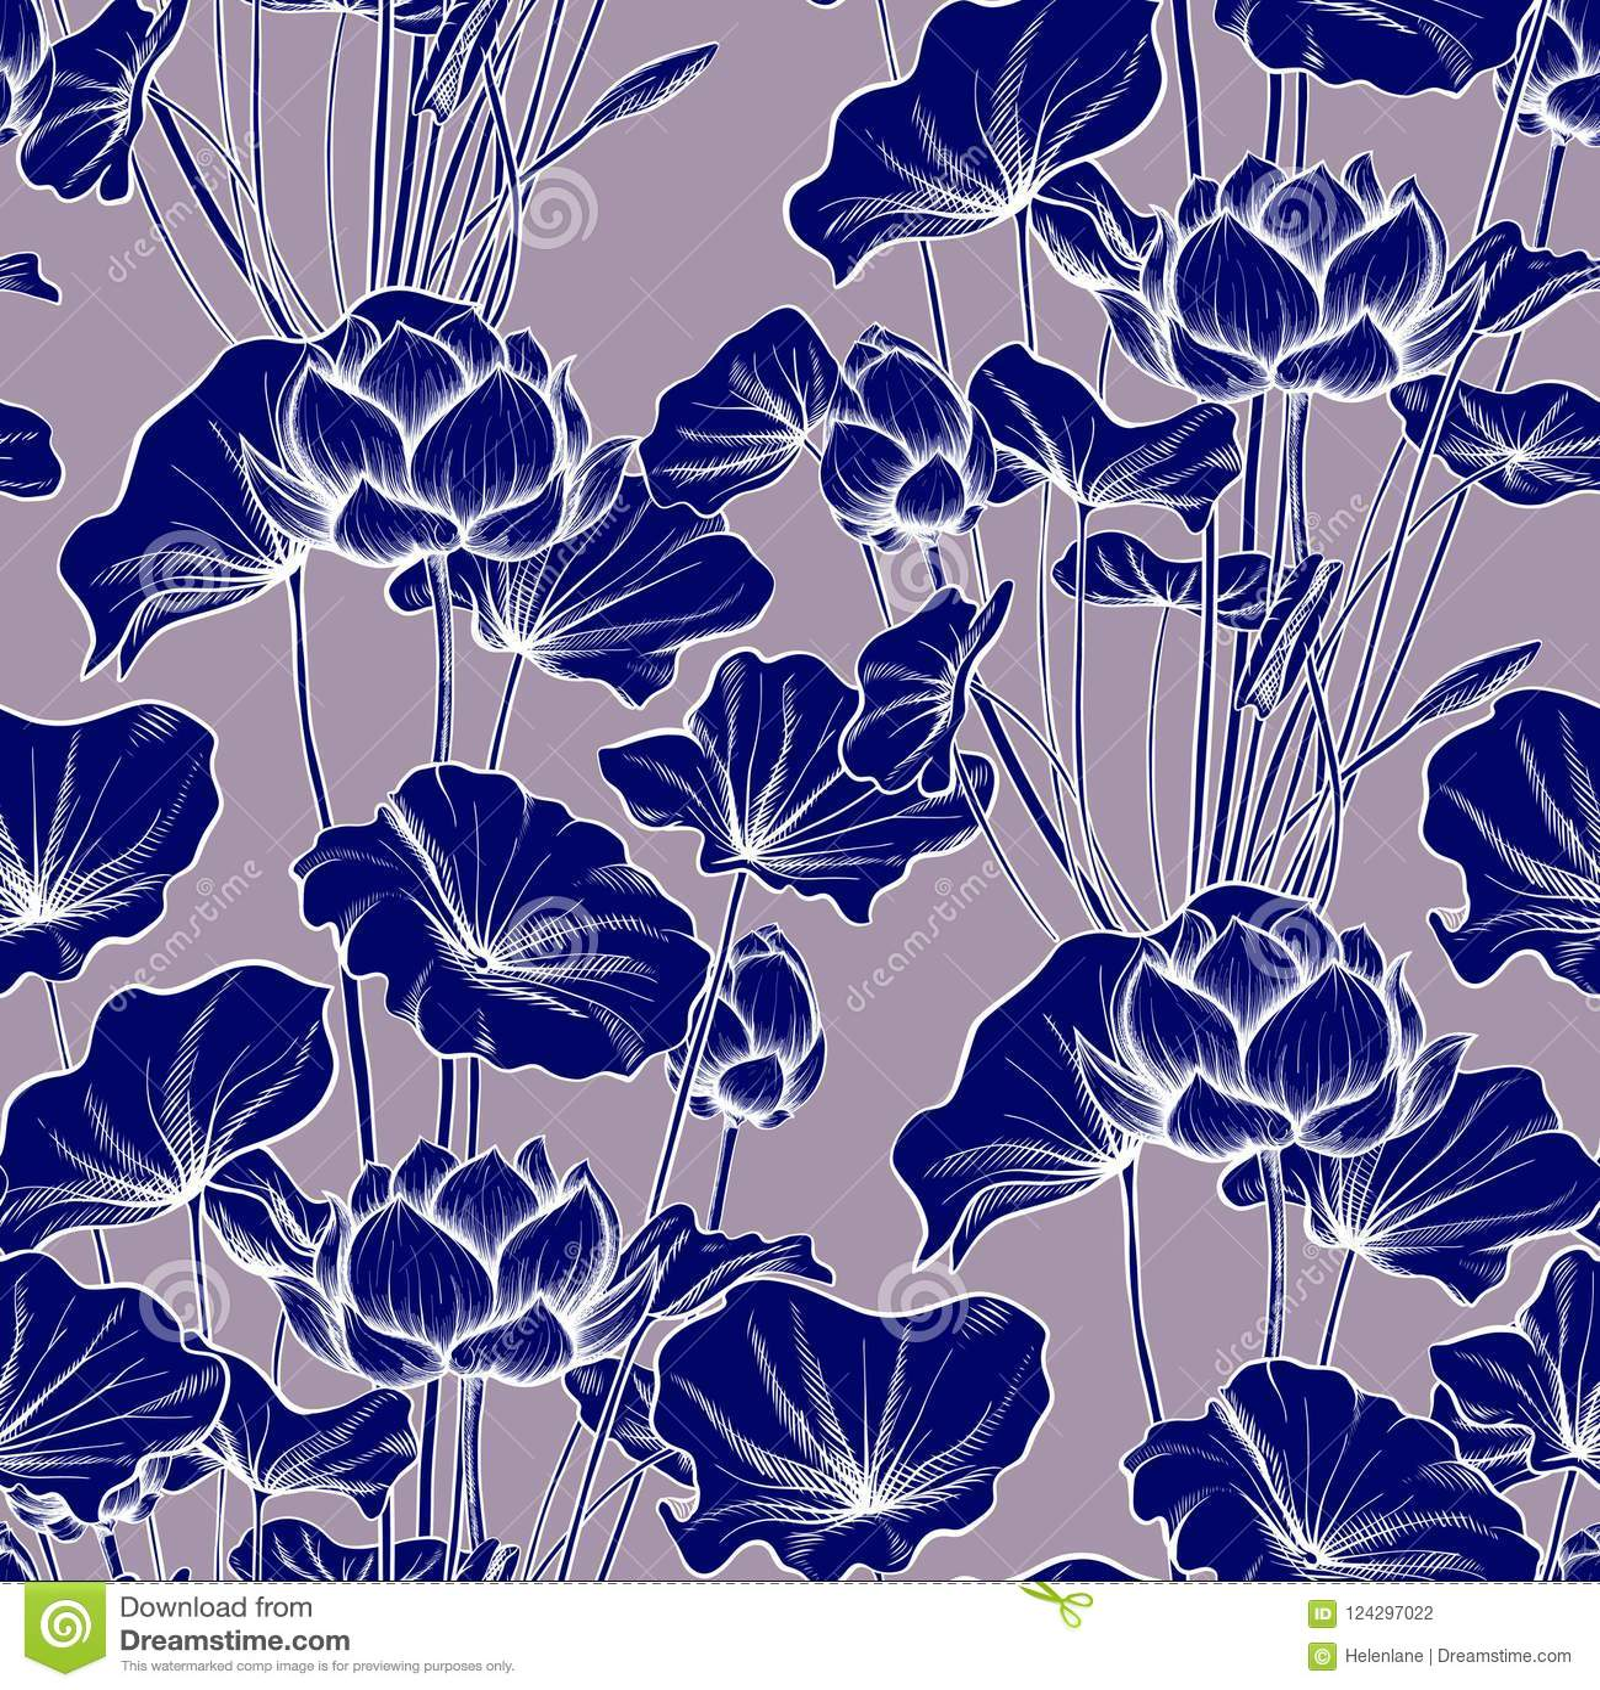 Seamless pattern, background with lotus flower. Botanical illustration style.